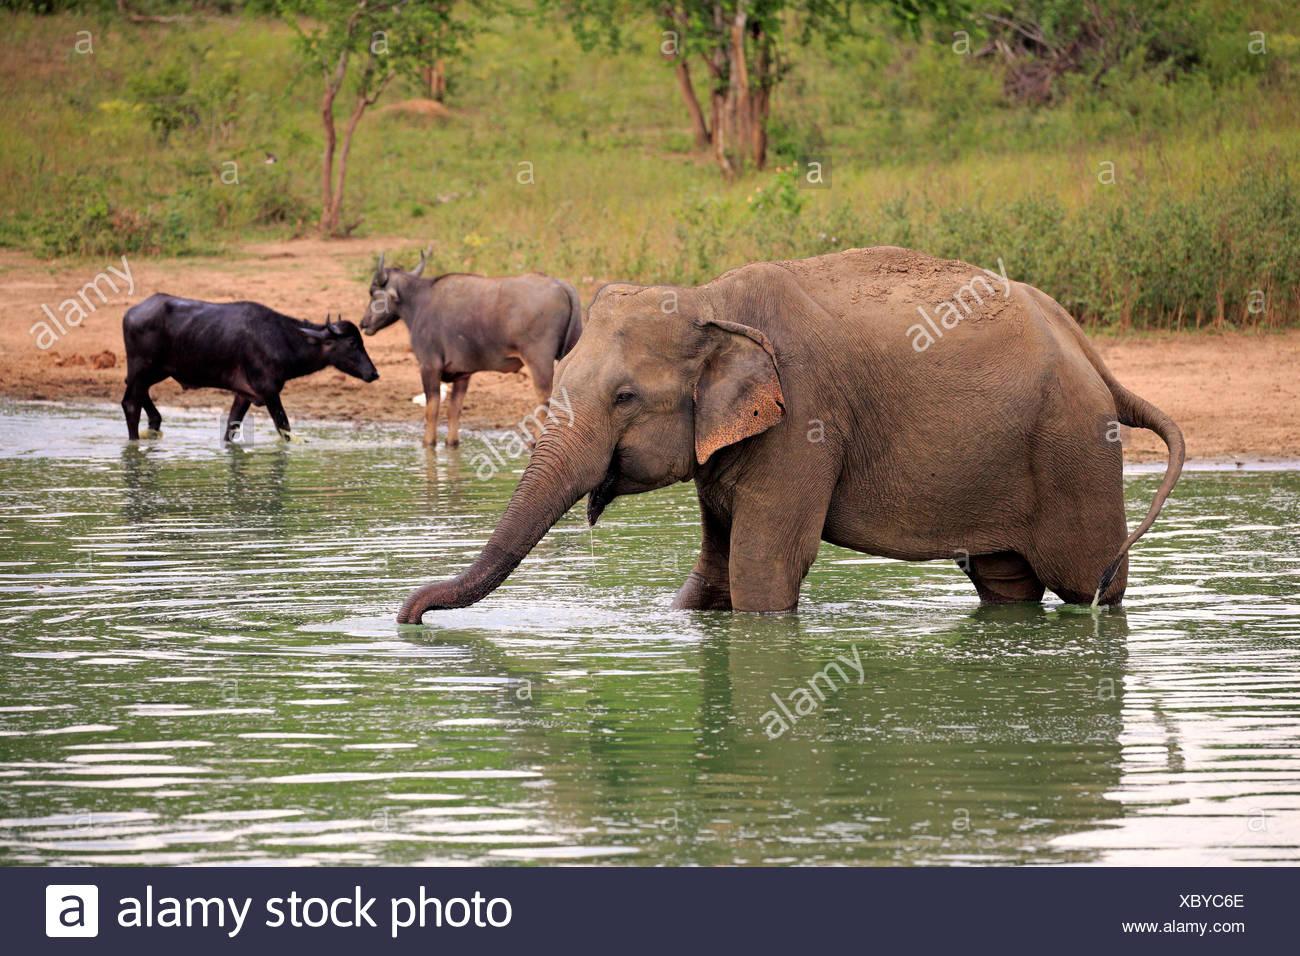 L'éléphant, du Sri Lanka, de l'éléphant d'Asie Nationalpark Udawalawe, Sri Lanka, Asie / (Elephas maximus maximus) Photo Stock